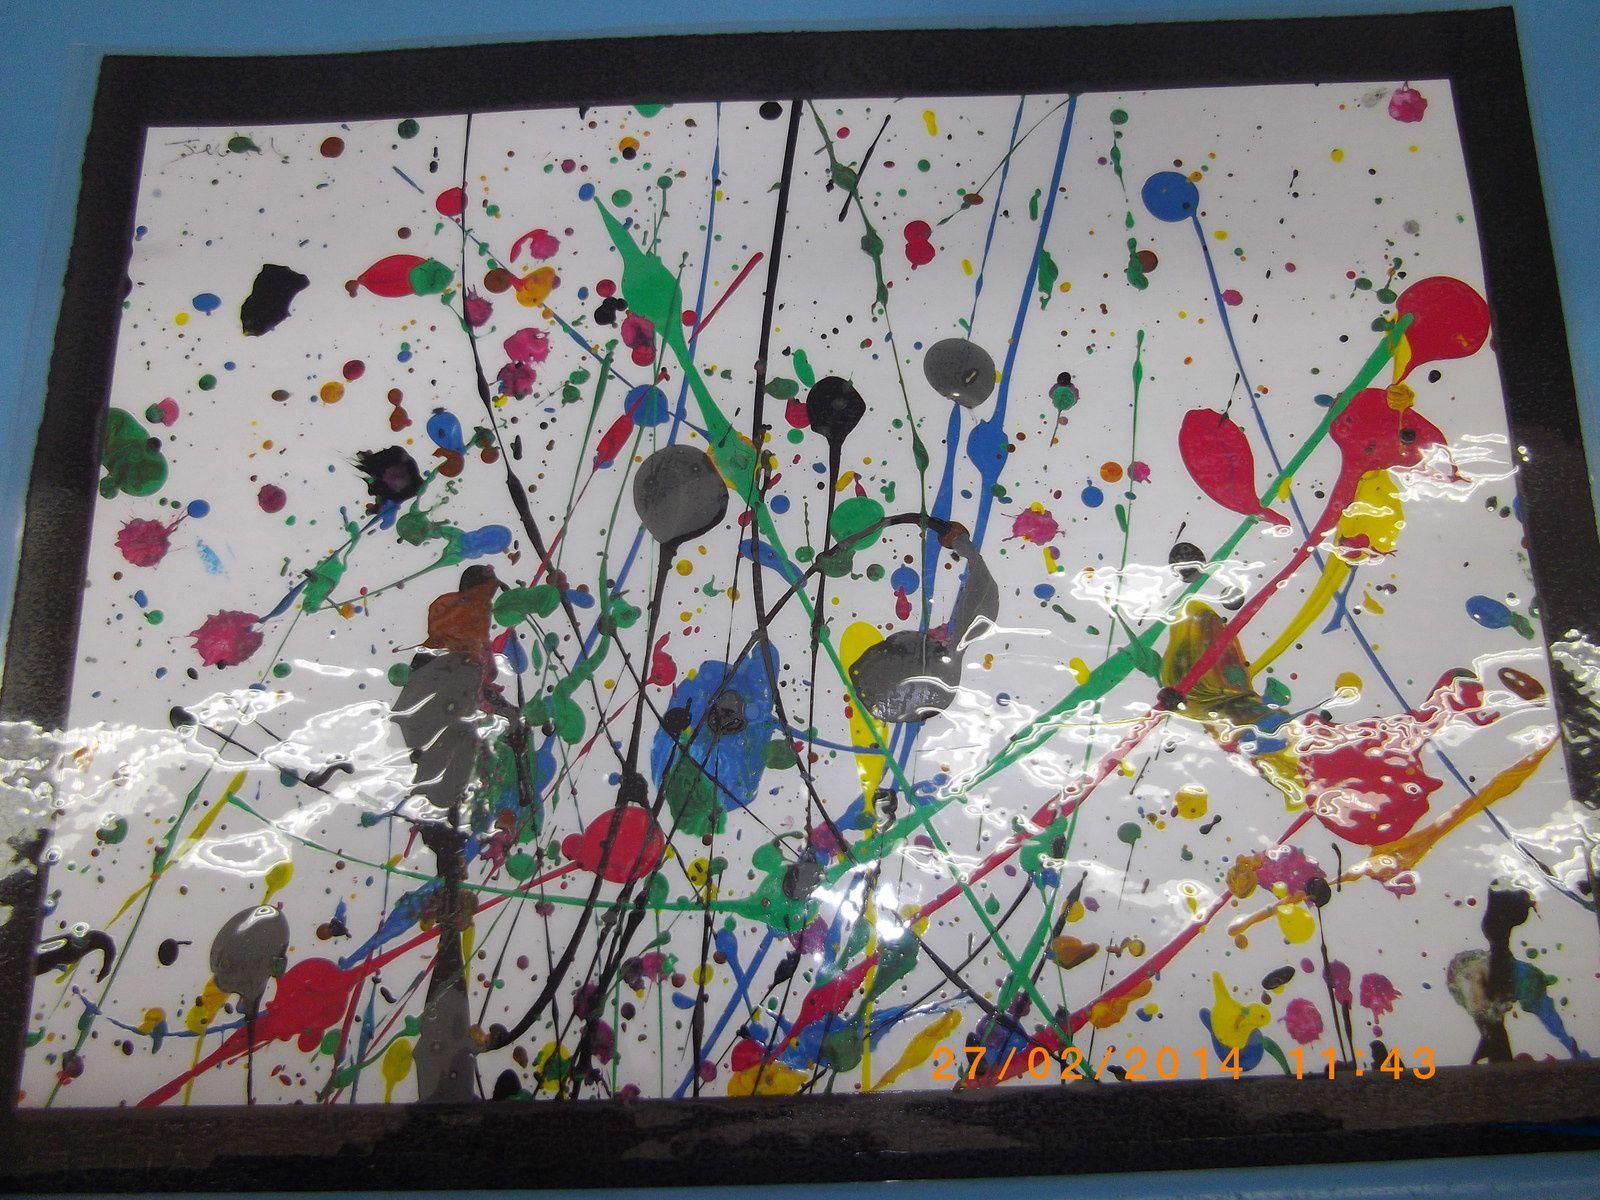 Exposition Sur Jackson Pollock En Clis Le Blog De Ecole